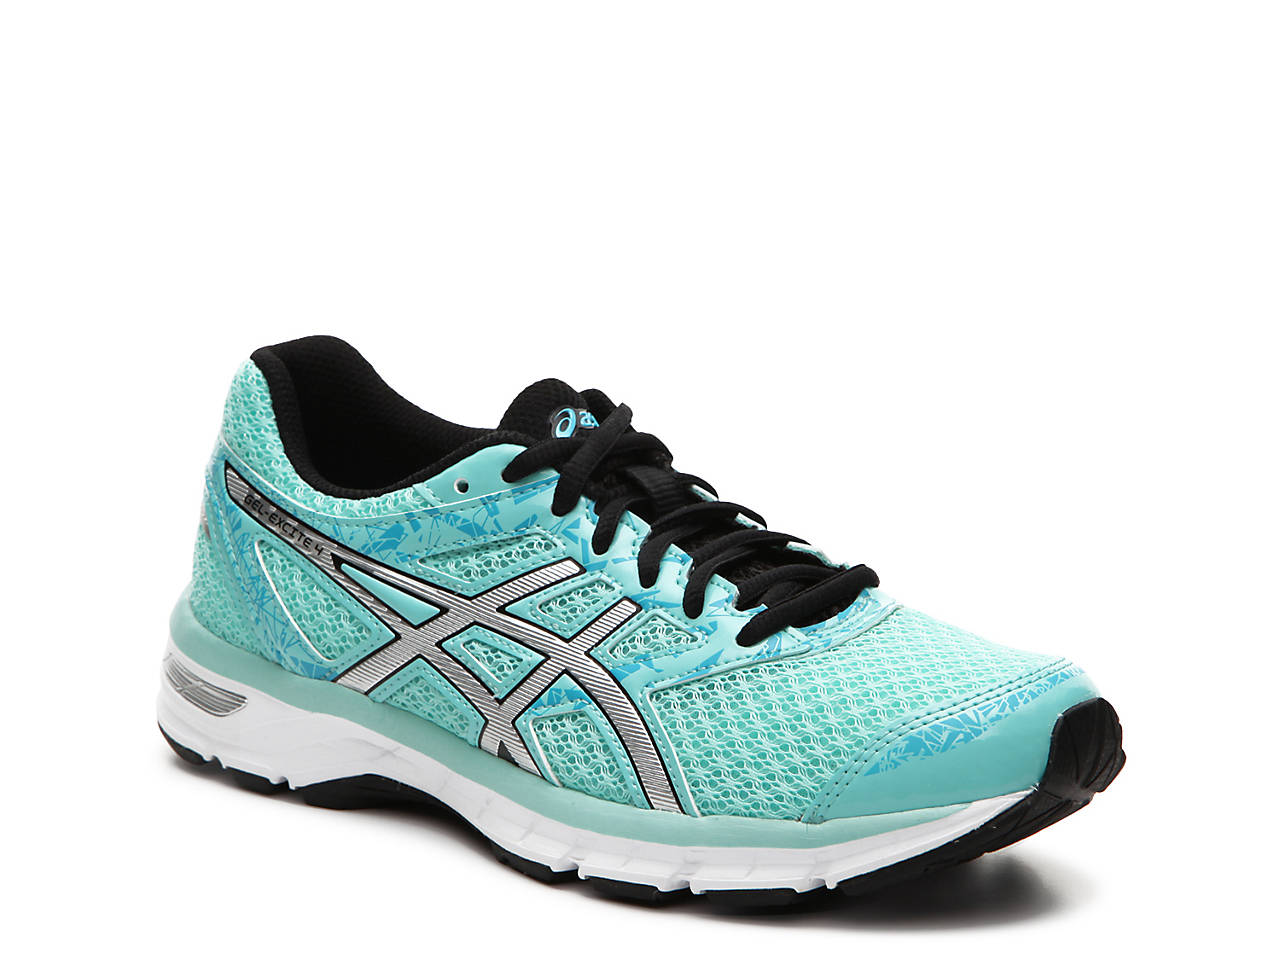 Excite 4 Running Shoe - Women's